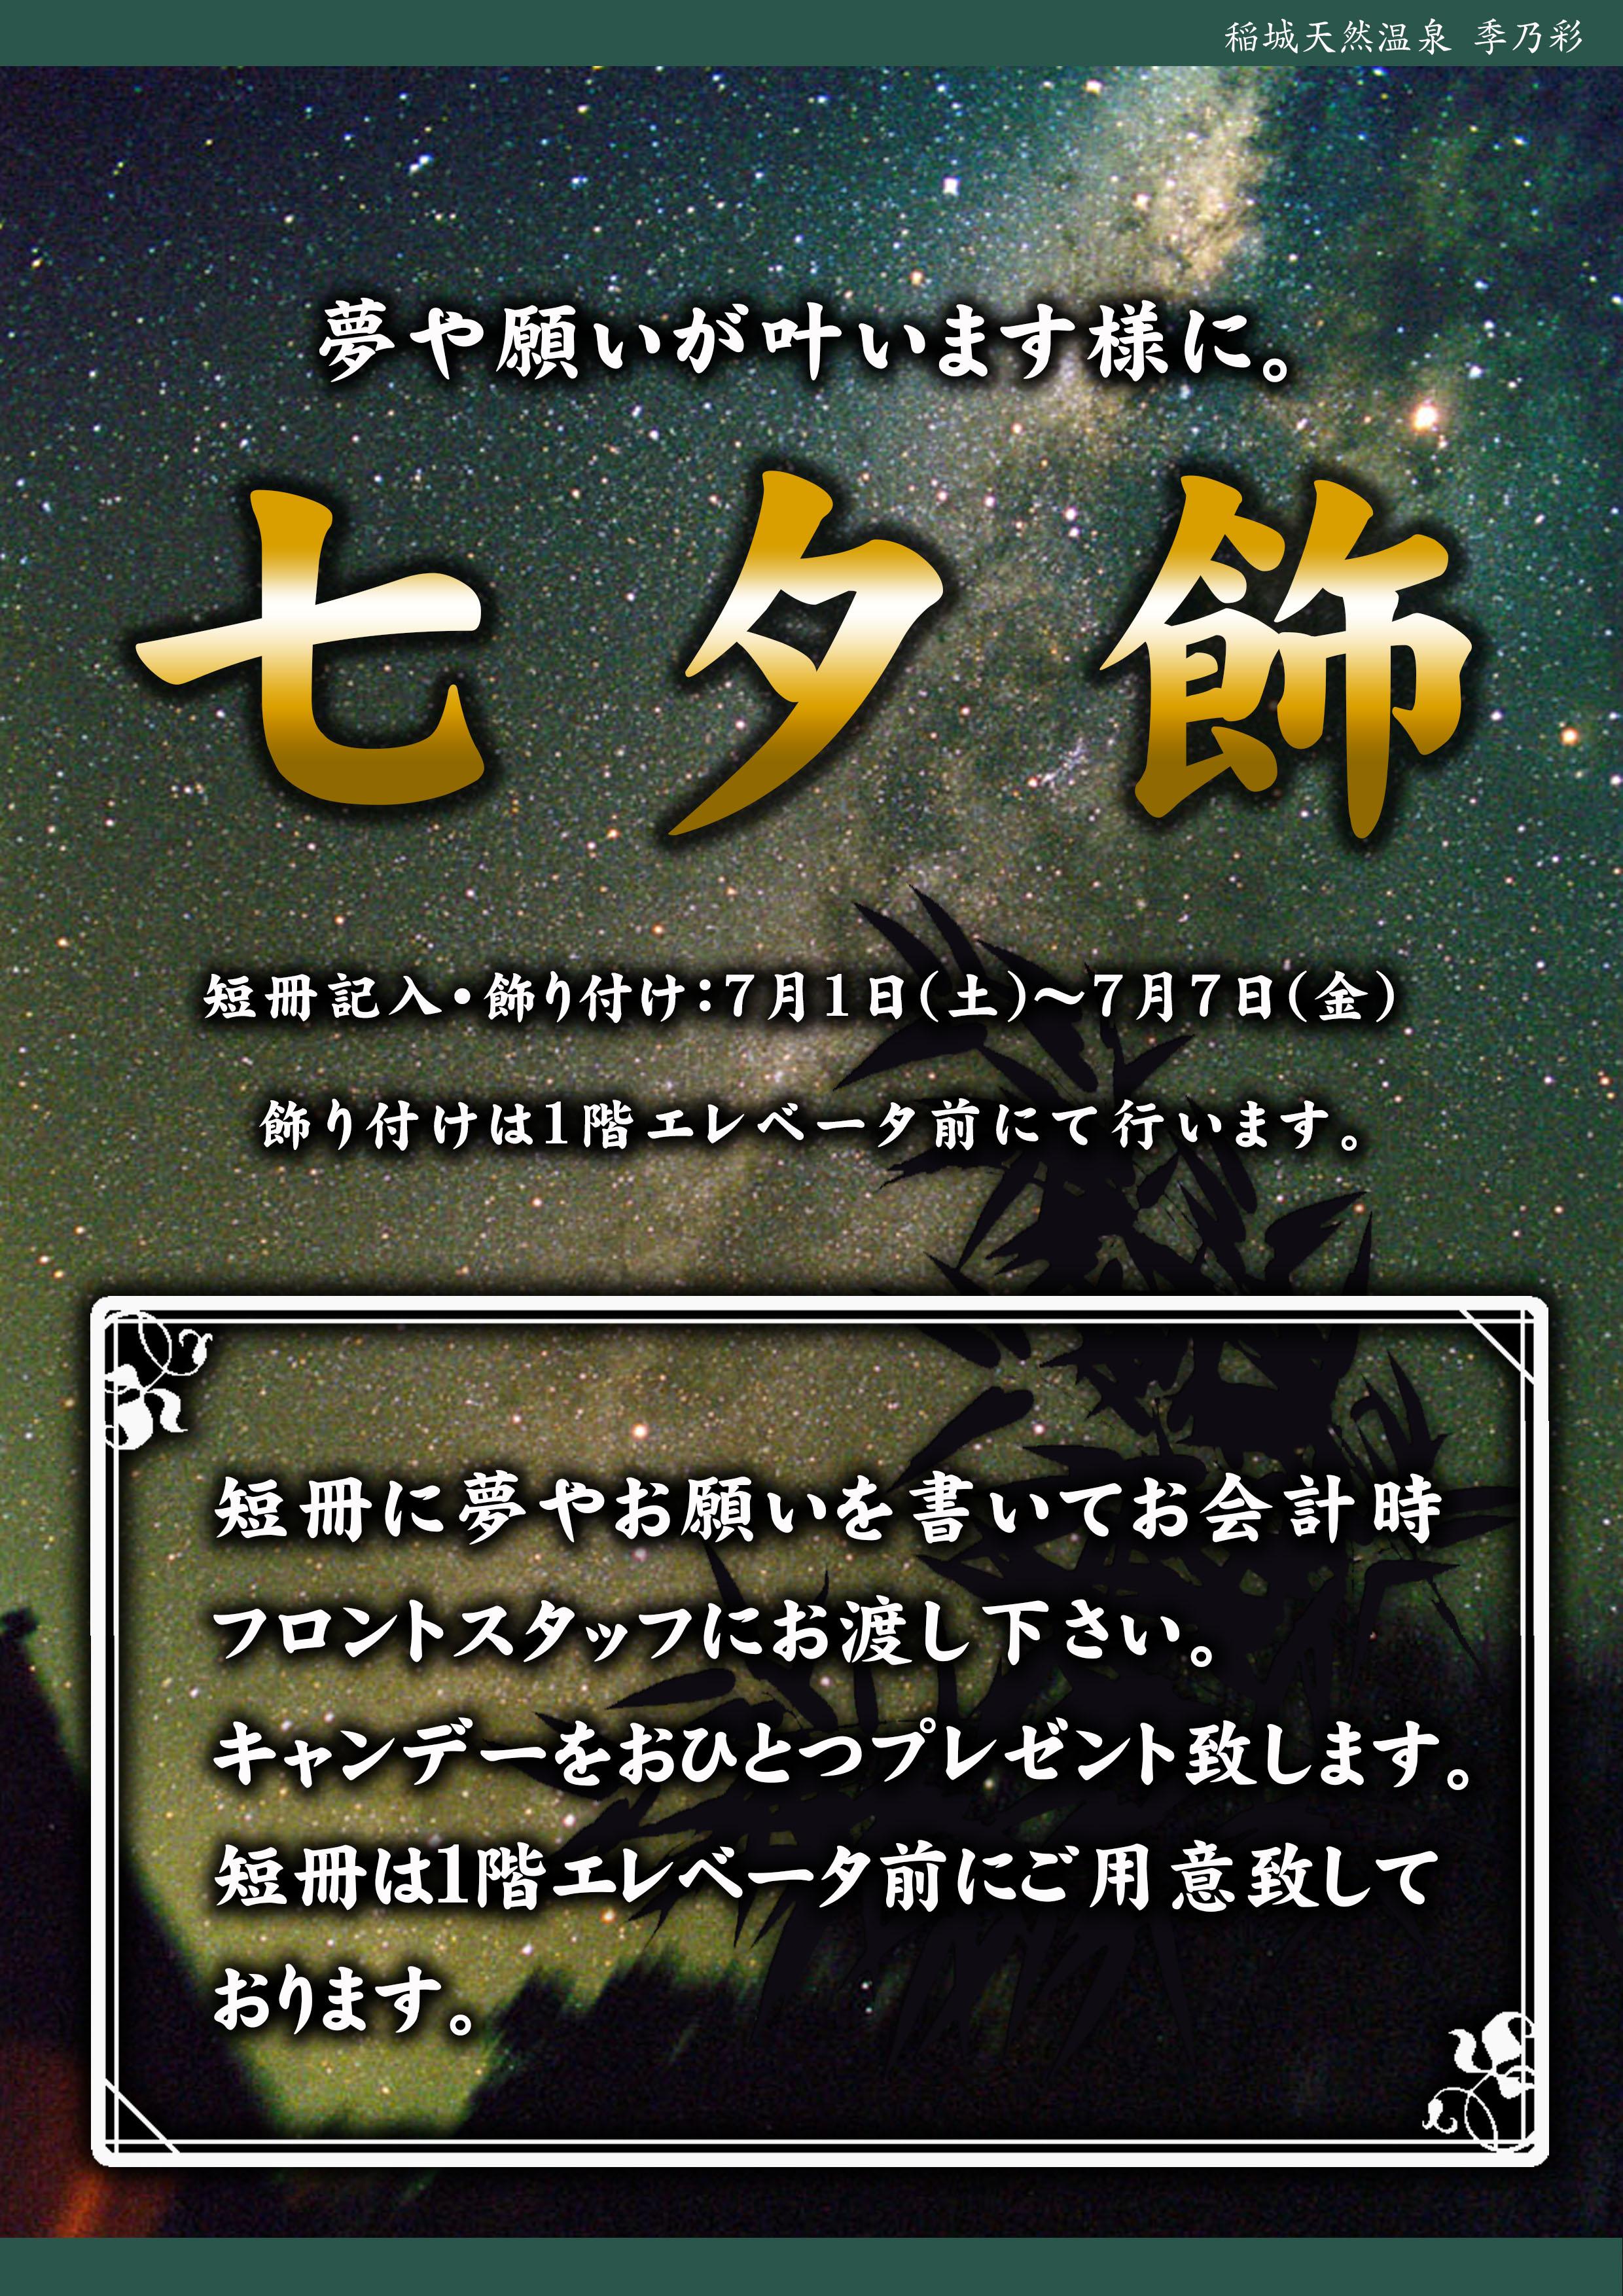 20170701POP イベント 6月 七夕飾り